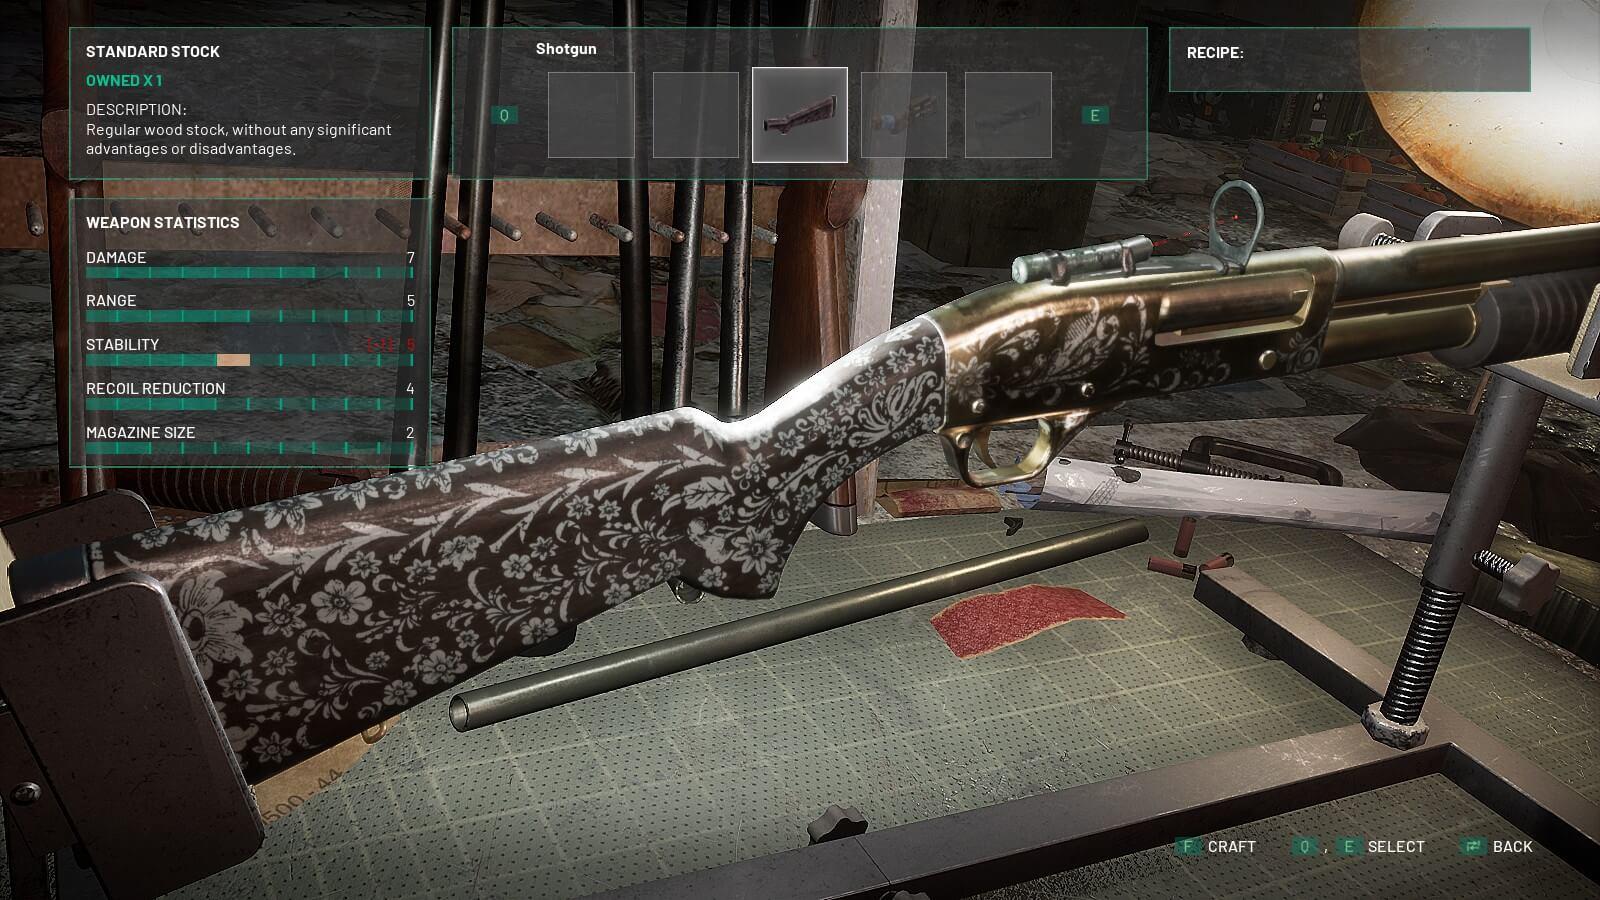 Chernobylite - Armas